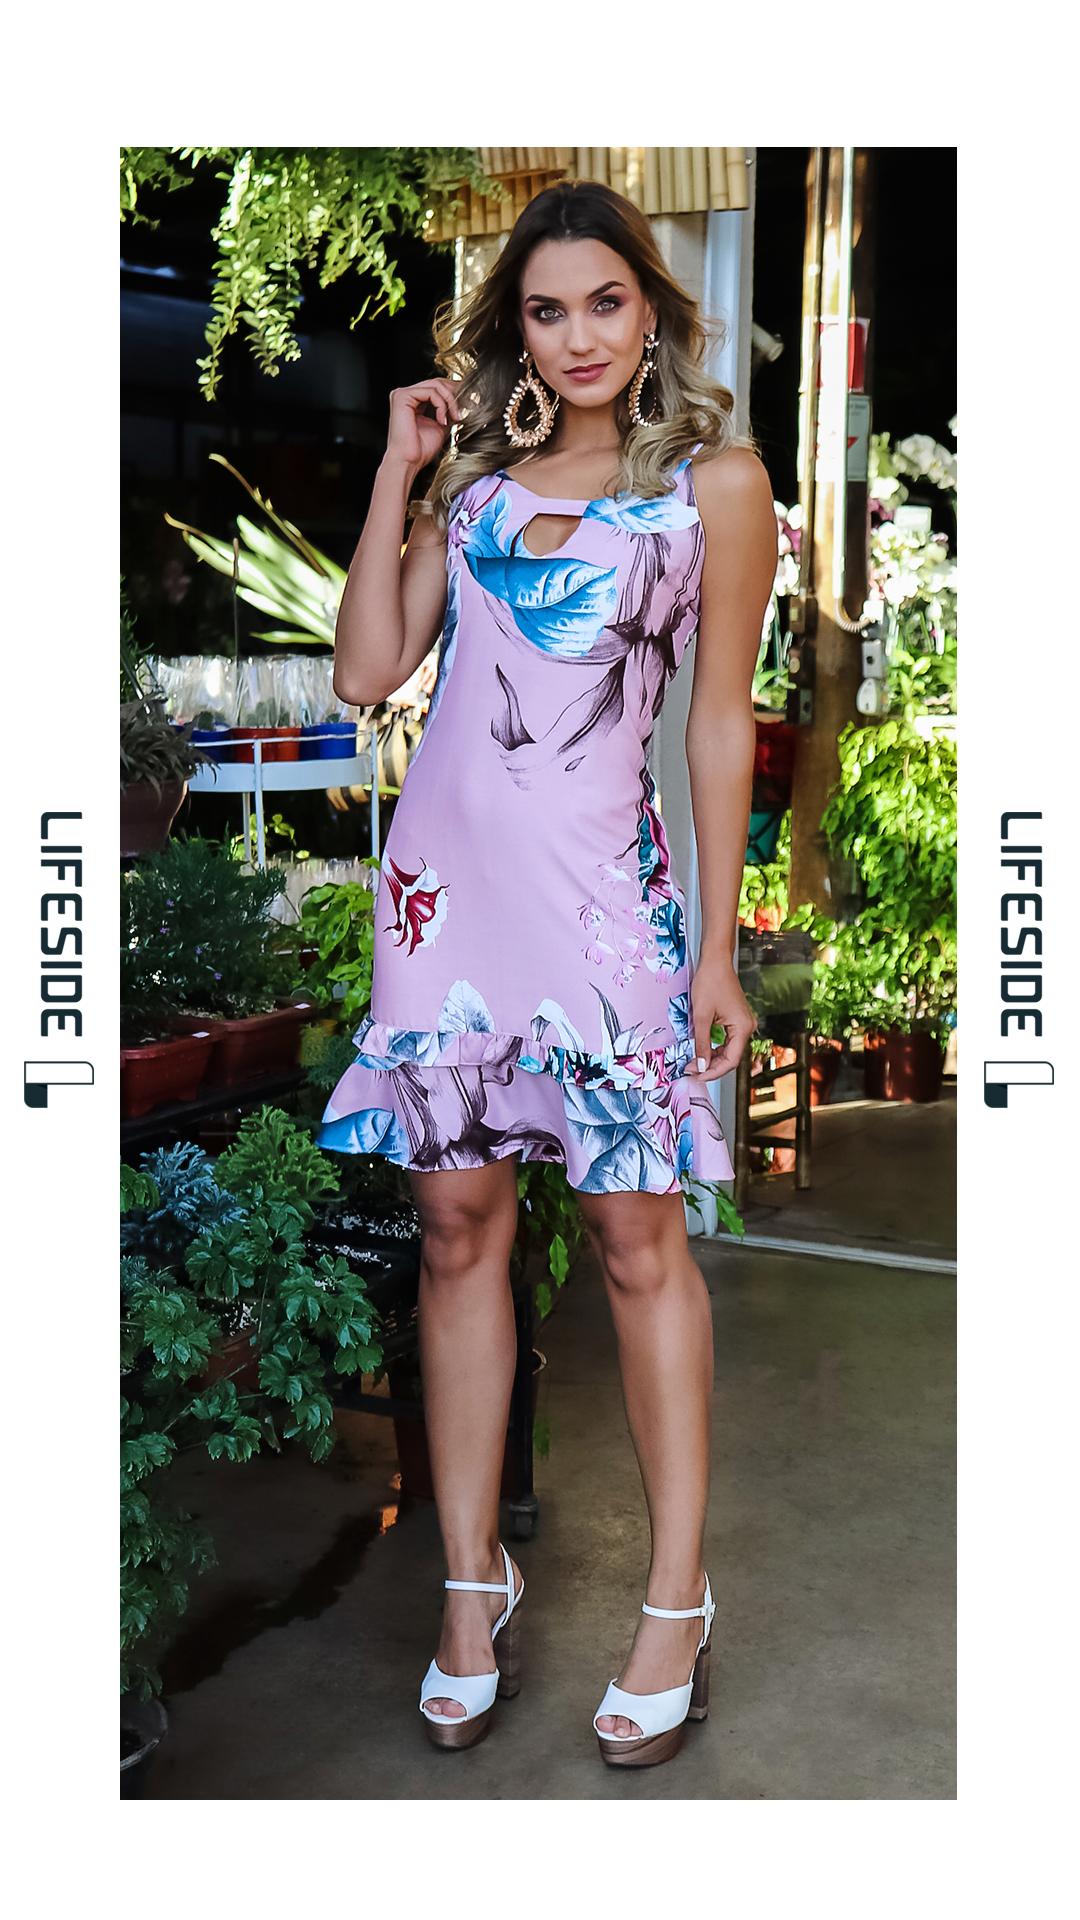 4f7bb1cd6 Vestido floral estampado. Vestido alegre. Vestido rosa. Vestido para ir em  festa de dia. #Vestido #Dress #Fashion #vestidoestampado